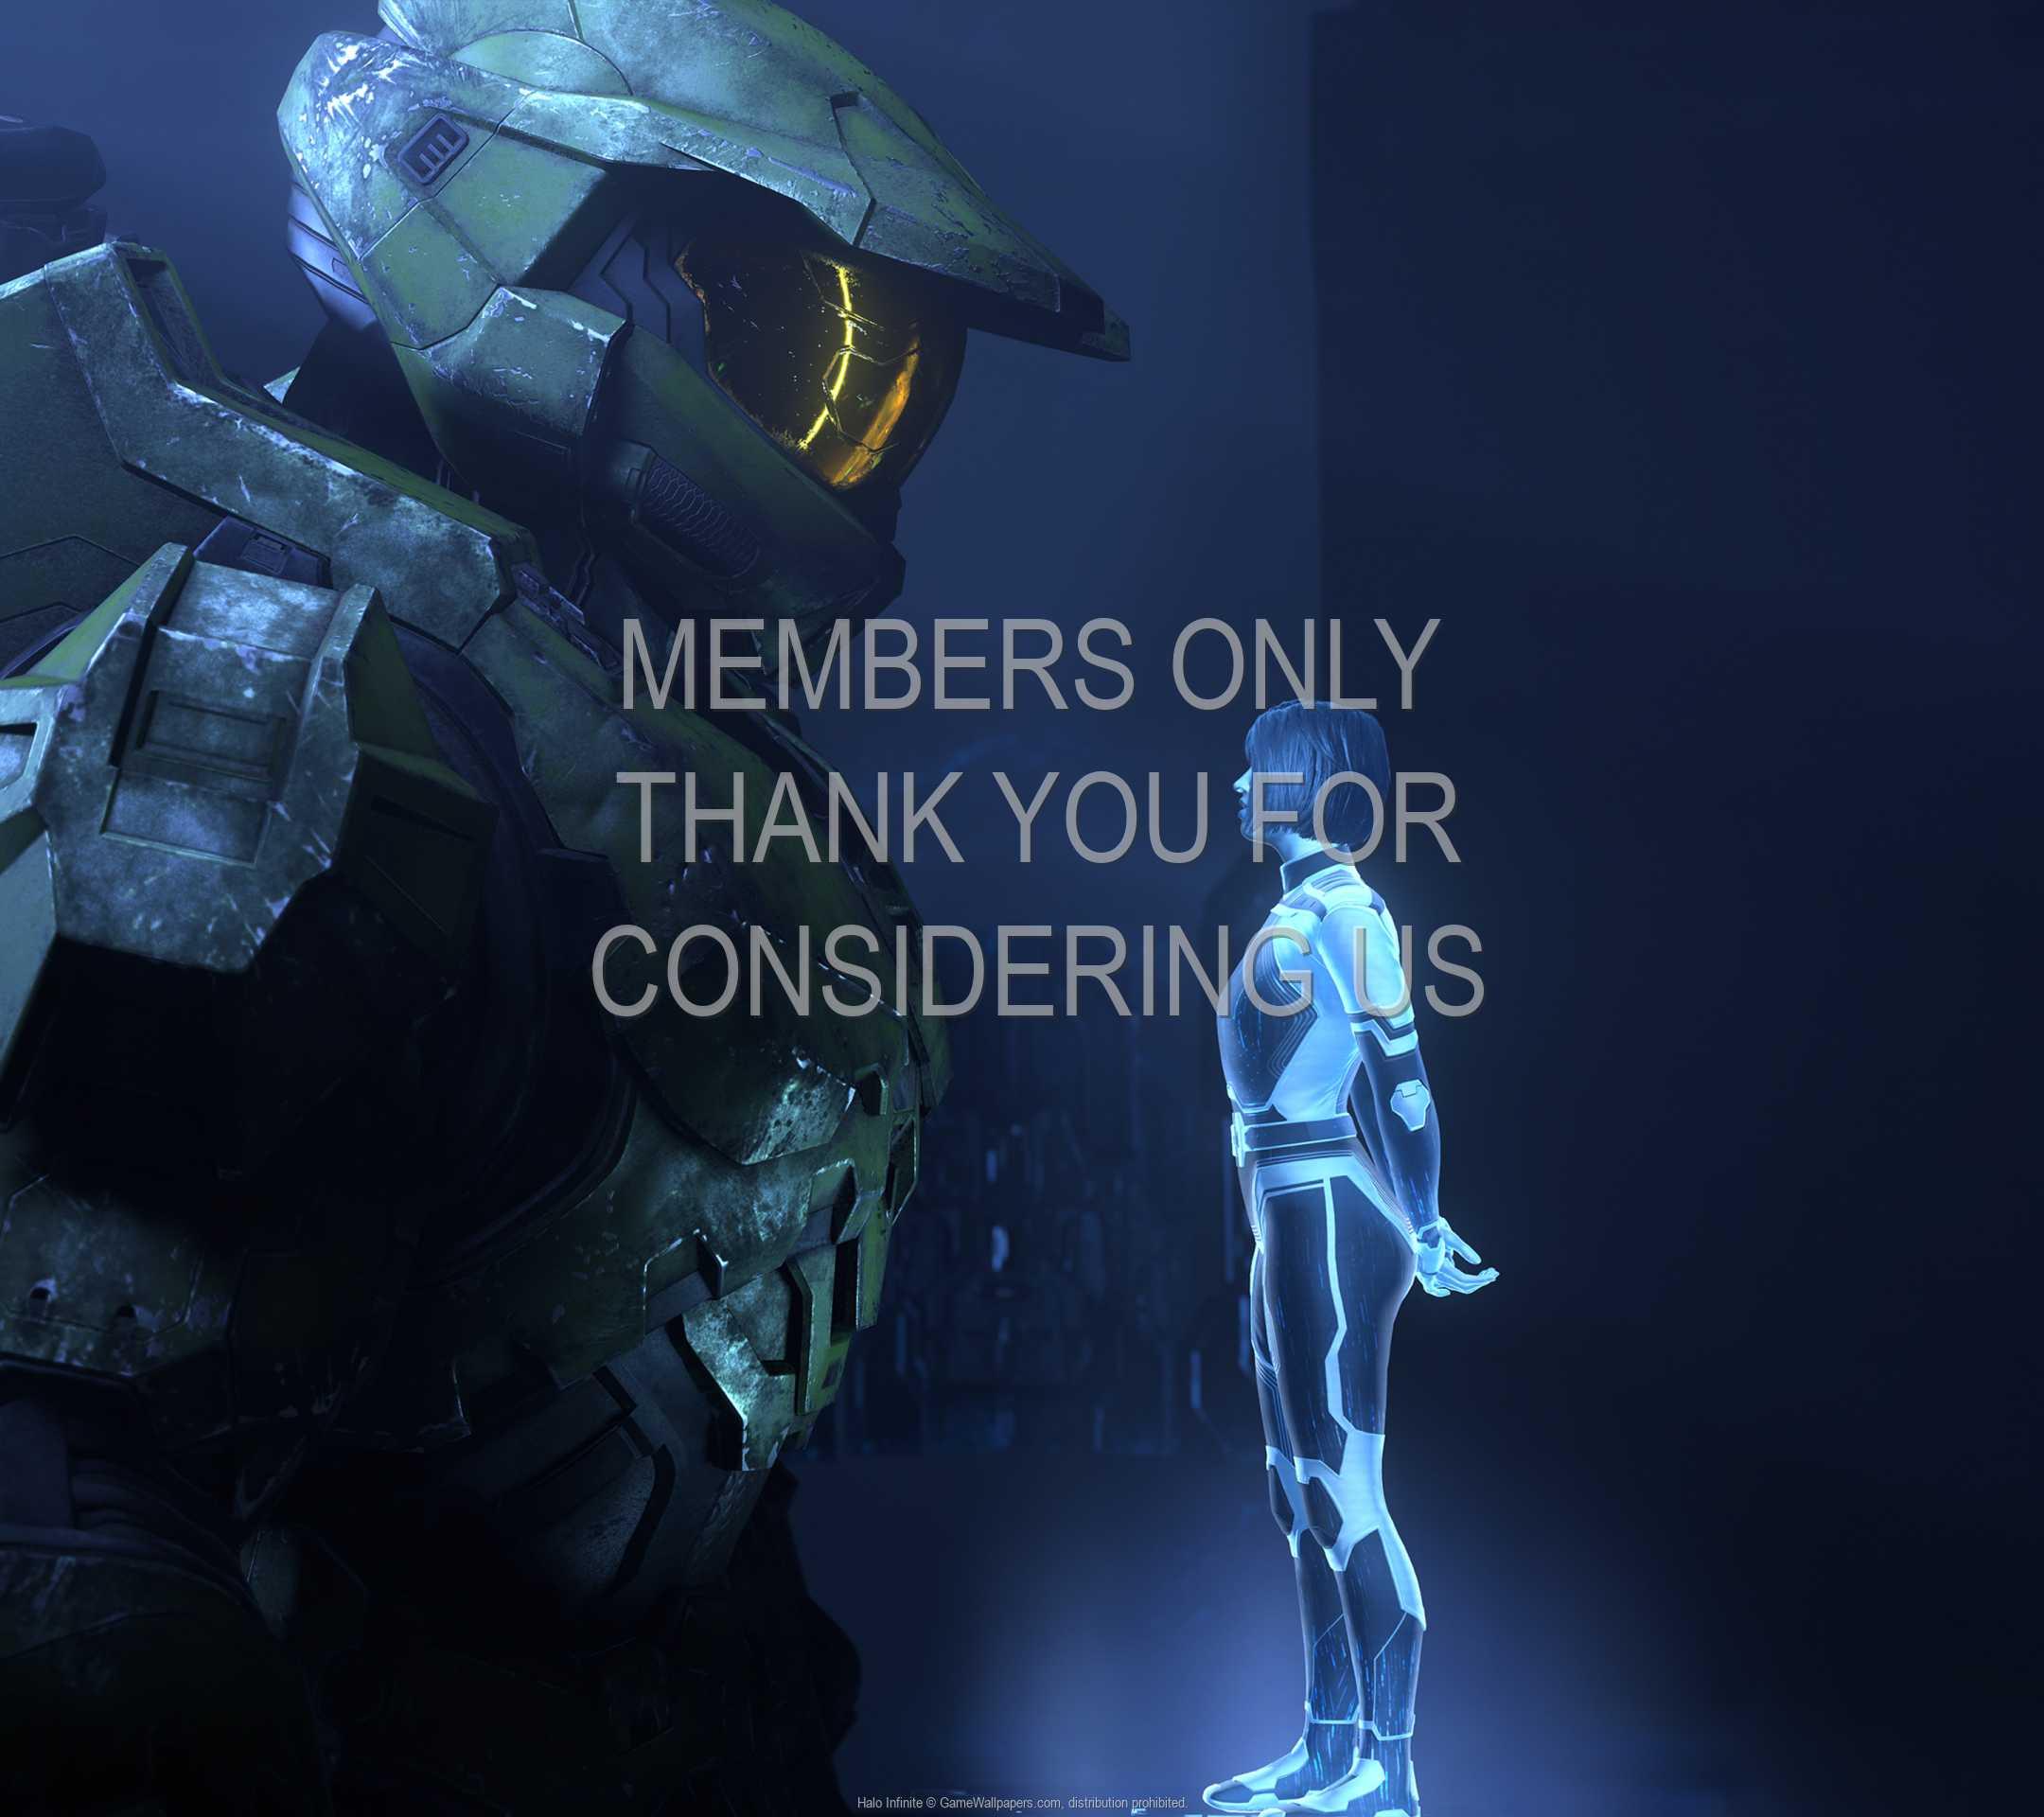 Halo: Infinite 1080p Horizontal Mobile wallpaper or background 10